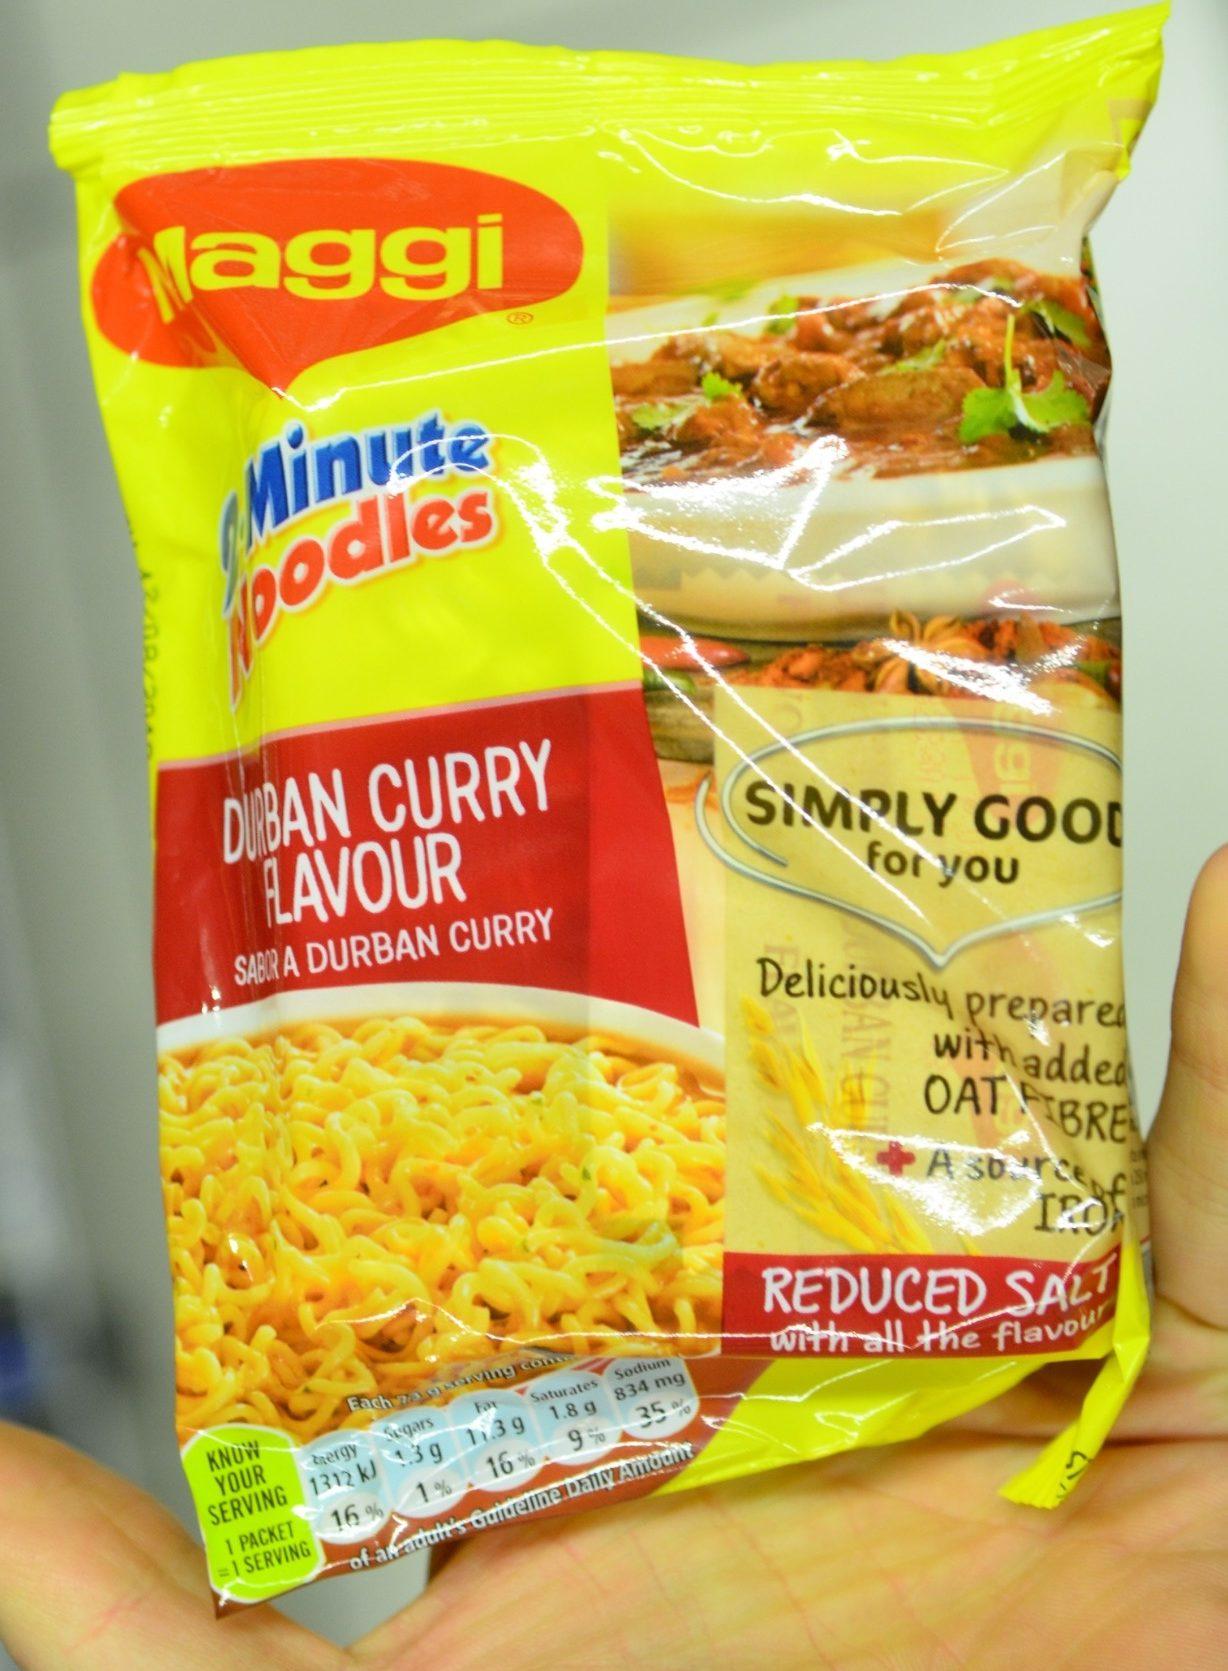 2 Minutes Noodles Durban Curry Flavour - Product